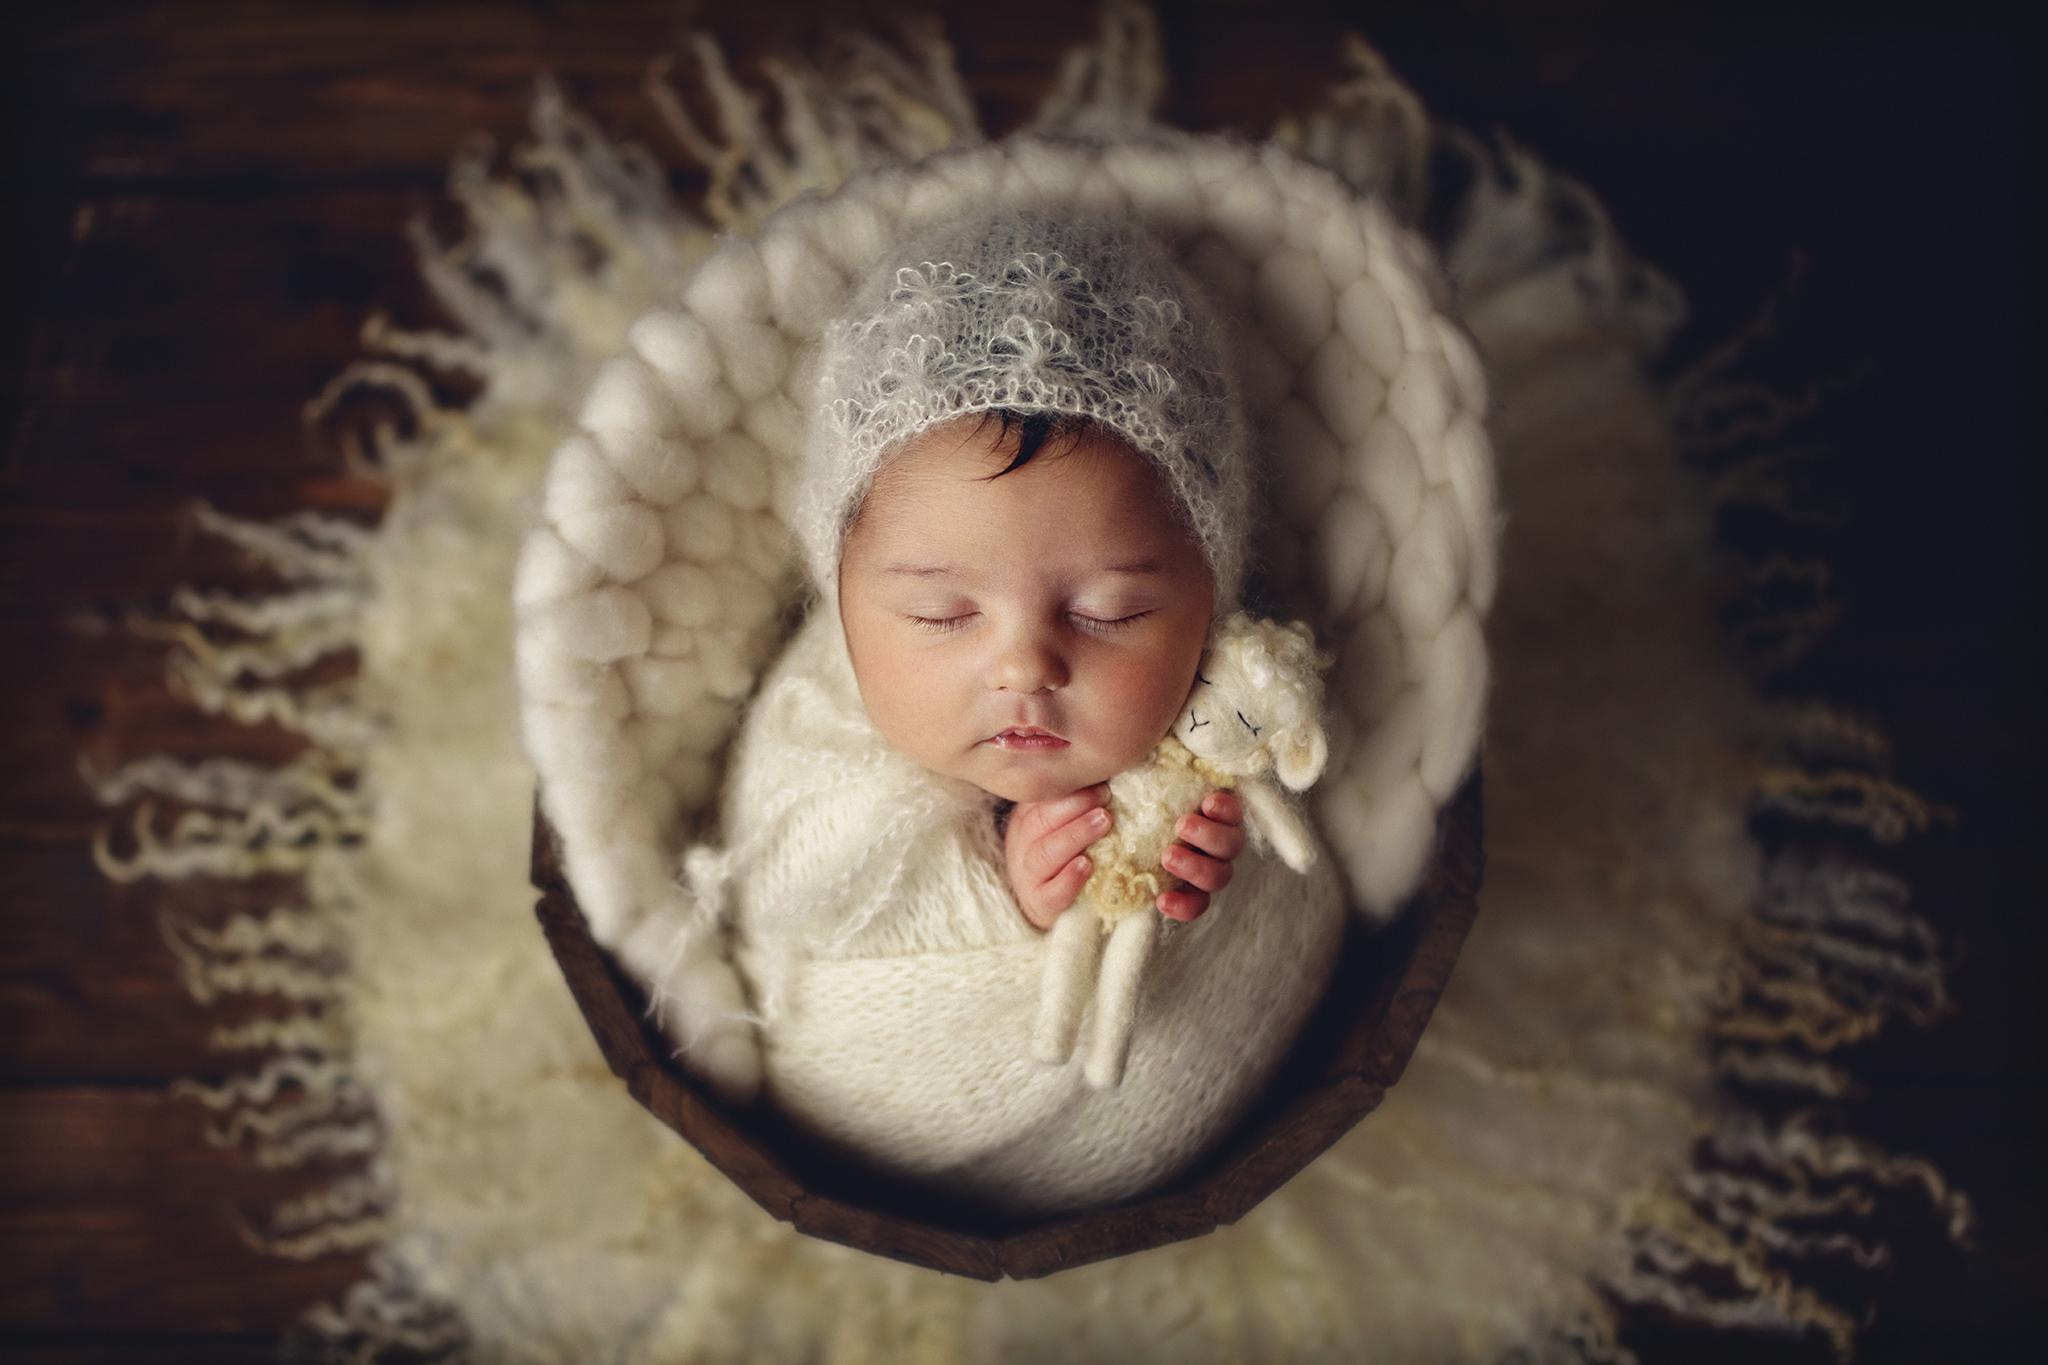 Michael Stief Maternity & Portrait Photography & Newborn Photography139.jpg